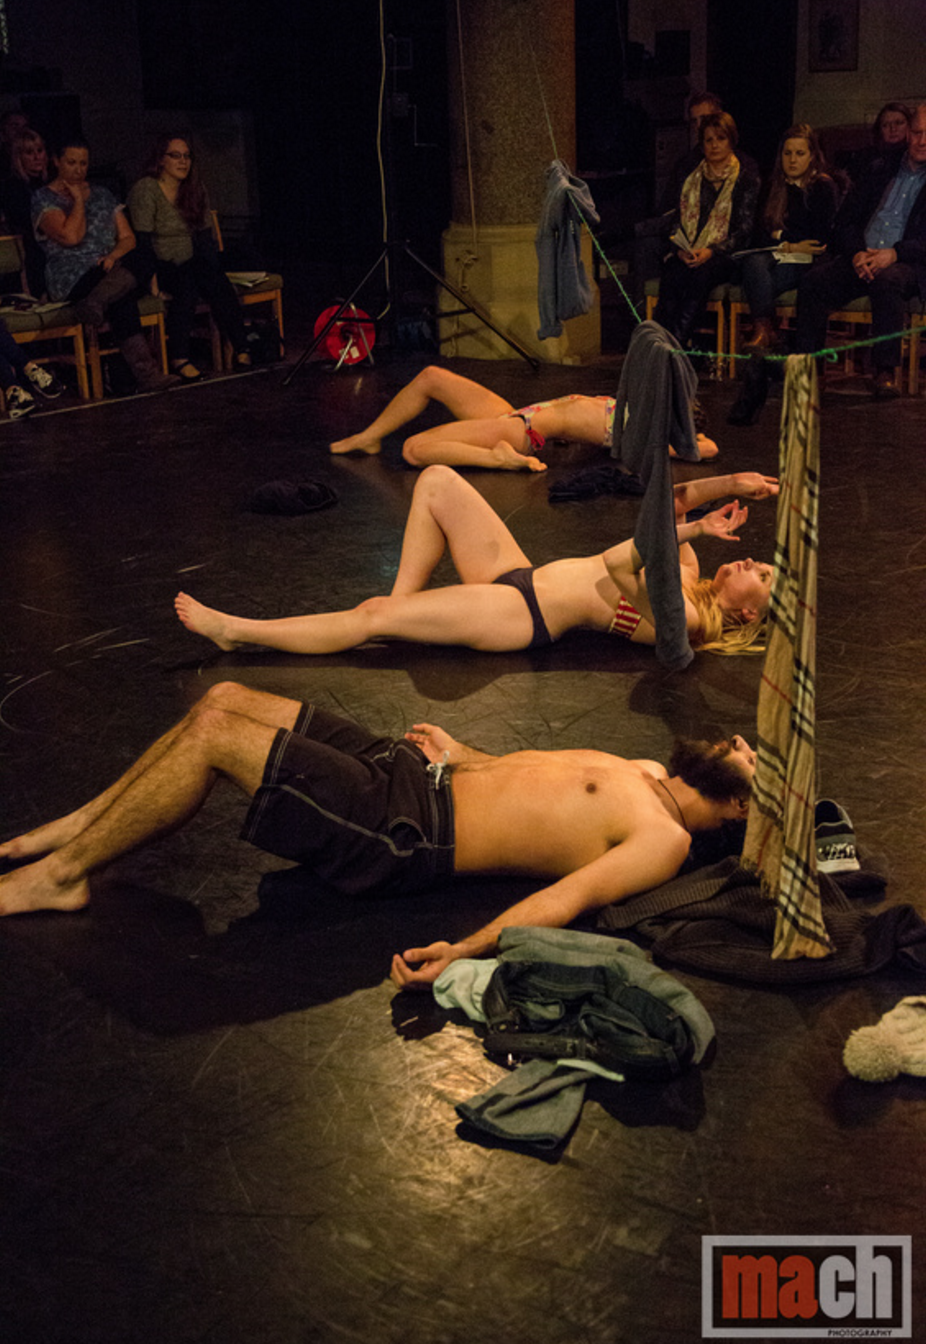 PLASIX - St. Barth's Theatre